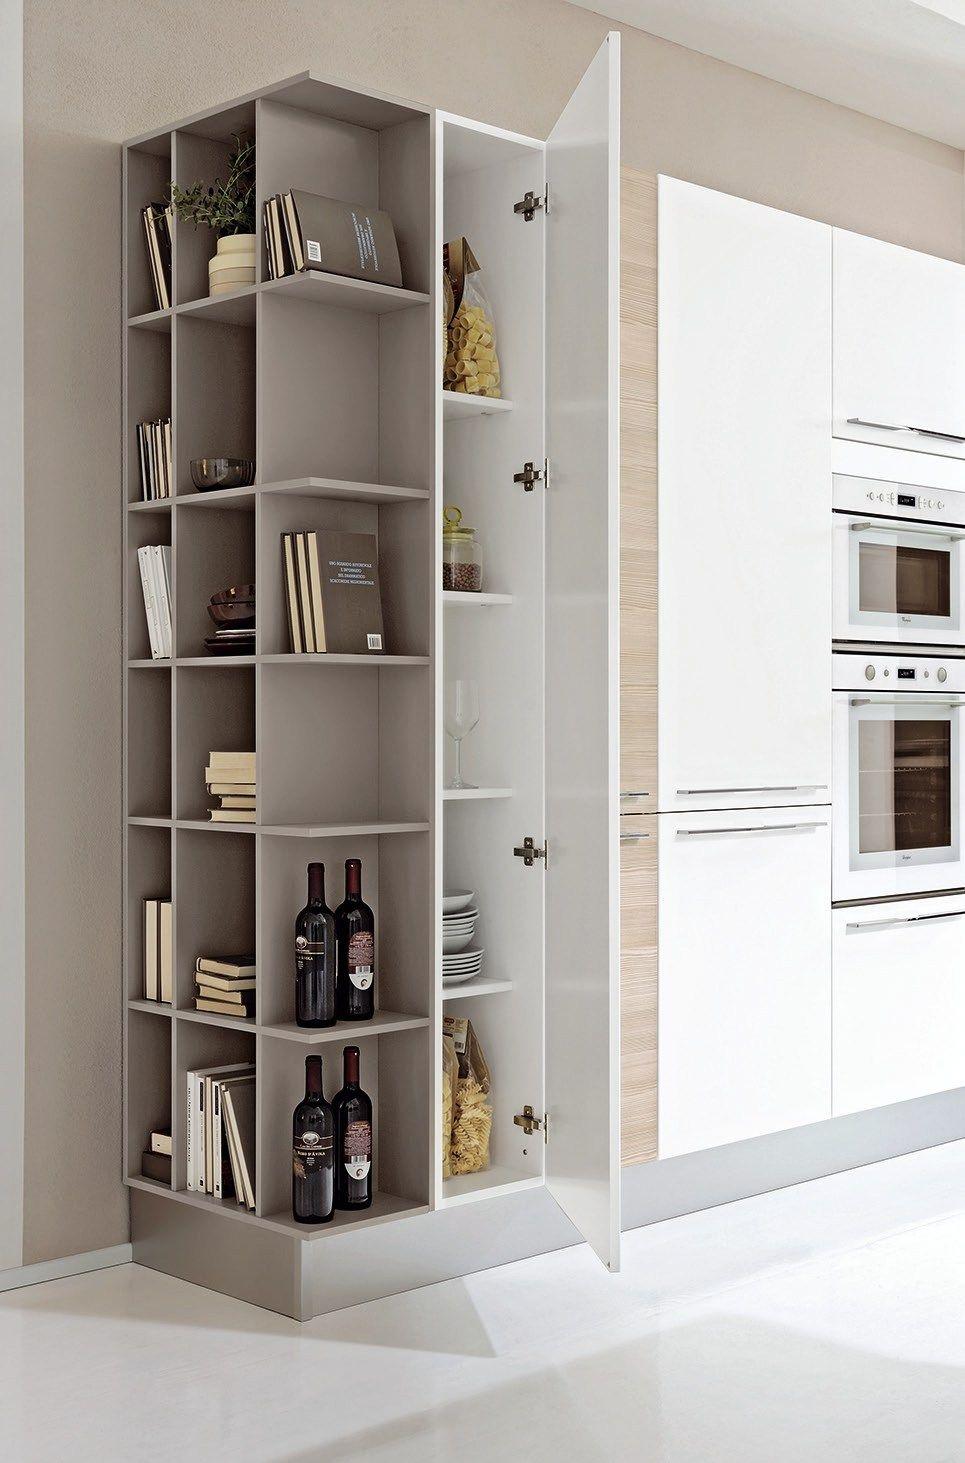 SWING   Fitted kitchen By Cucine Lube design Studio Ferriani